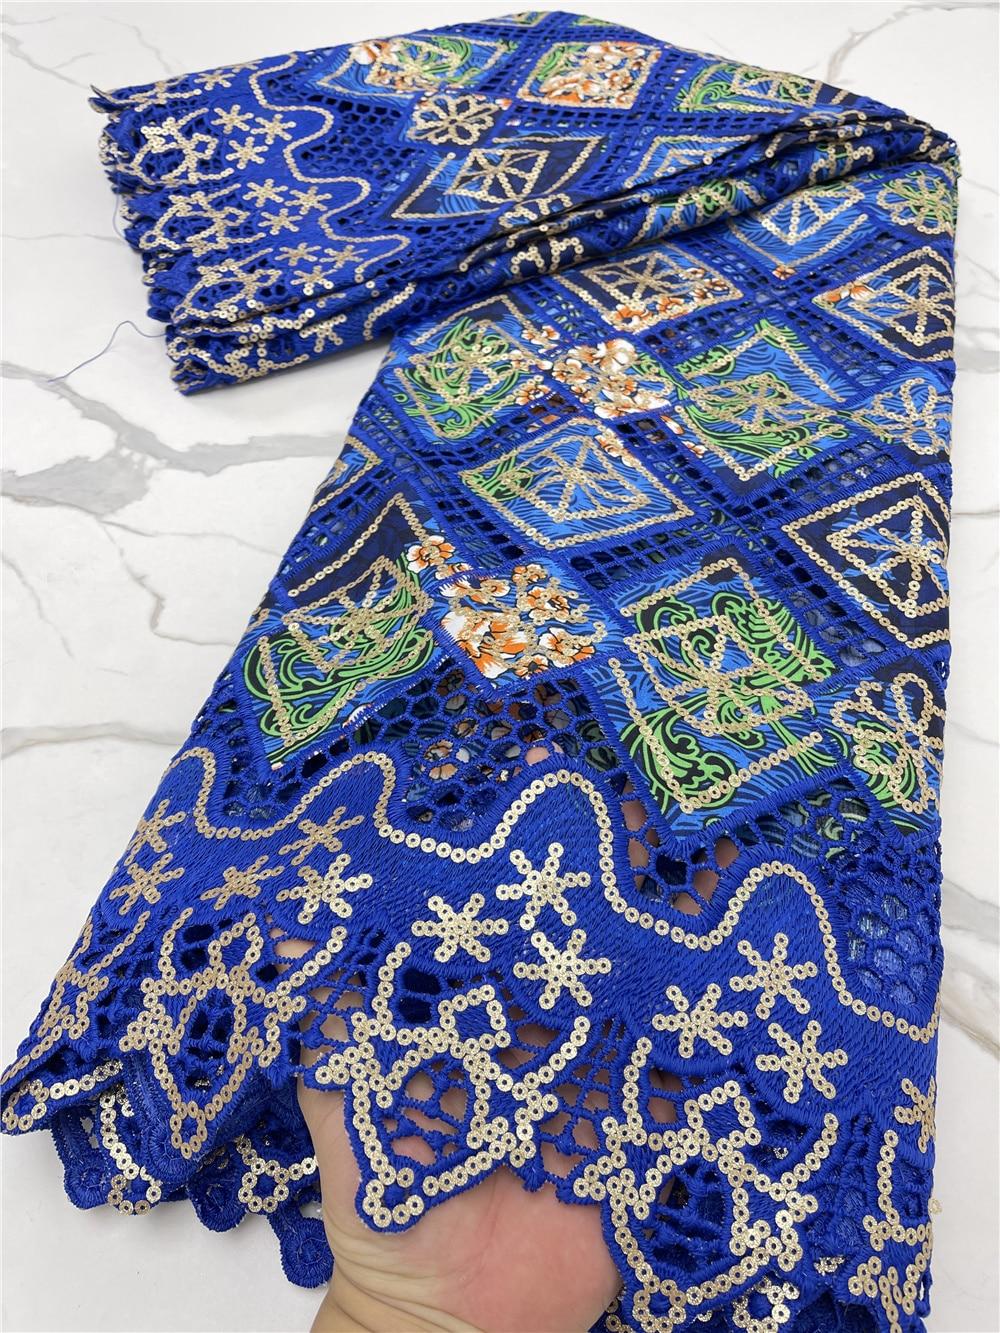 PGC الأزرق الأفريقي الشمع الترتر أقمشة الدانتيل 2021 شمسيّة دانتيل عالية الجودة النيجيري الفرنسية أقمشة الدانتيل لفستان الزفاف الخياطة YA4211B-3